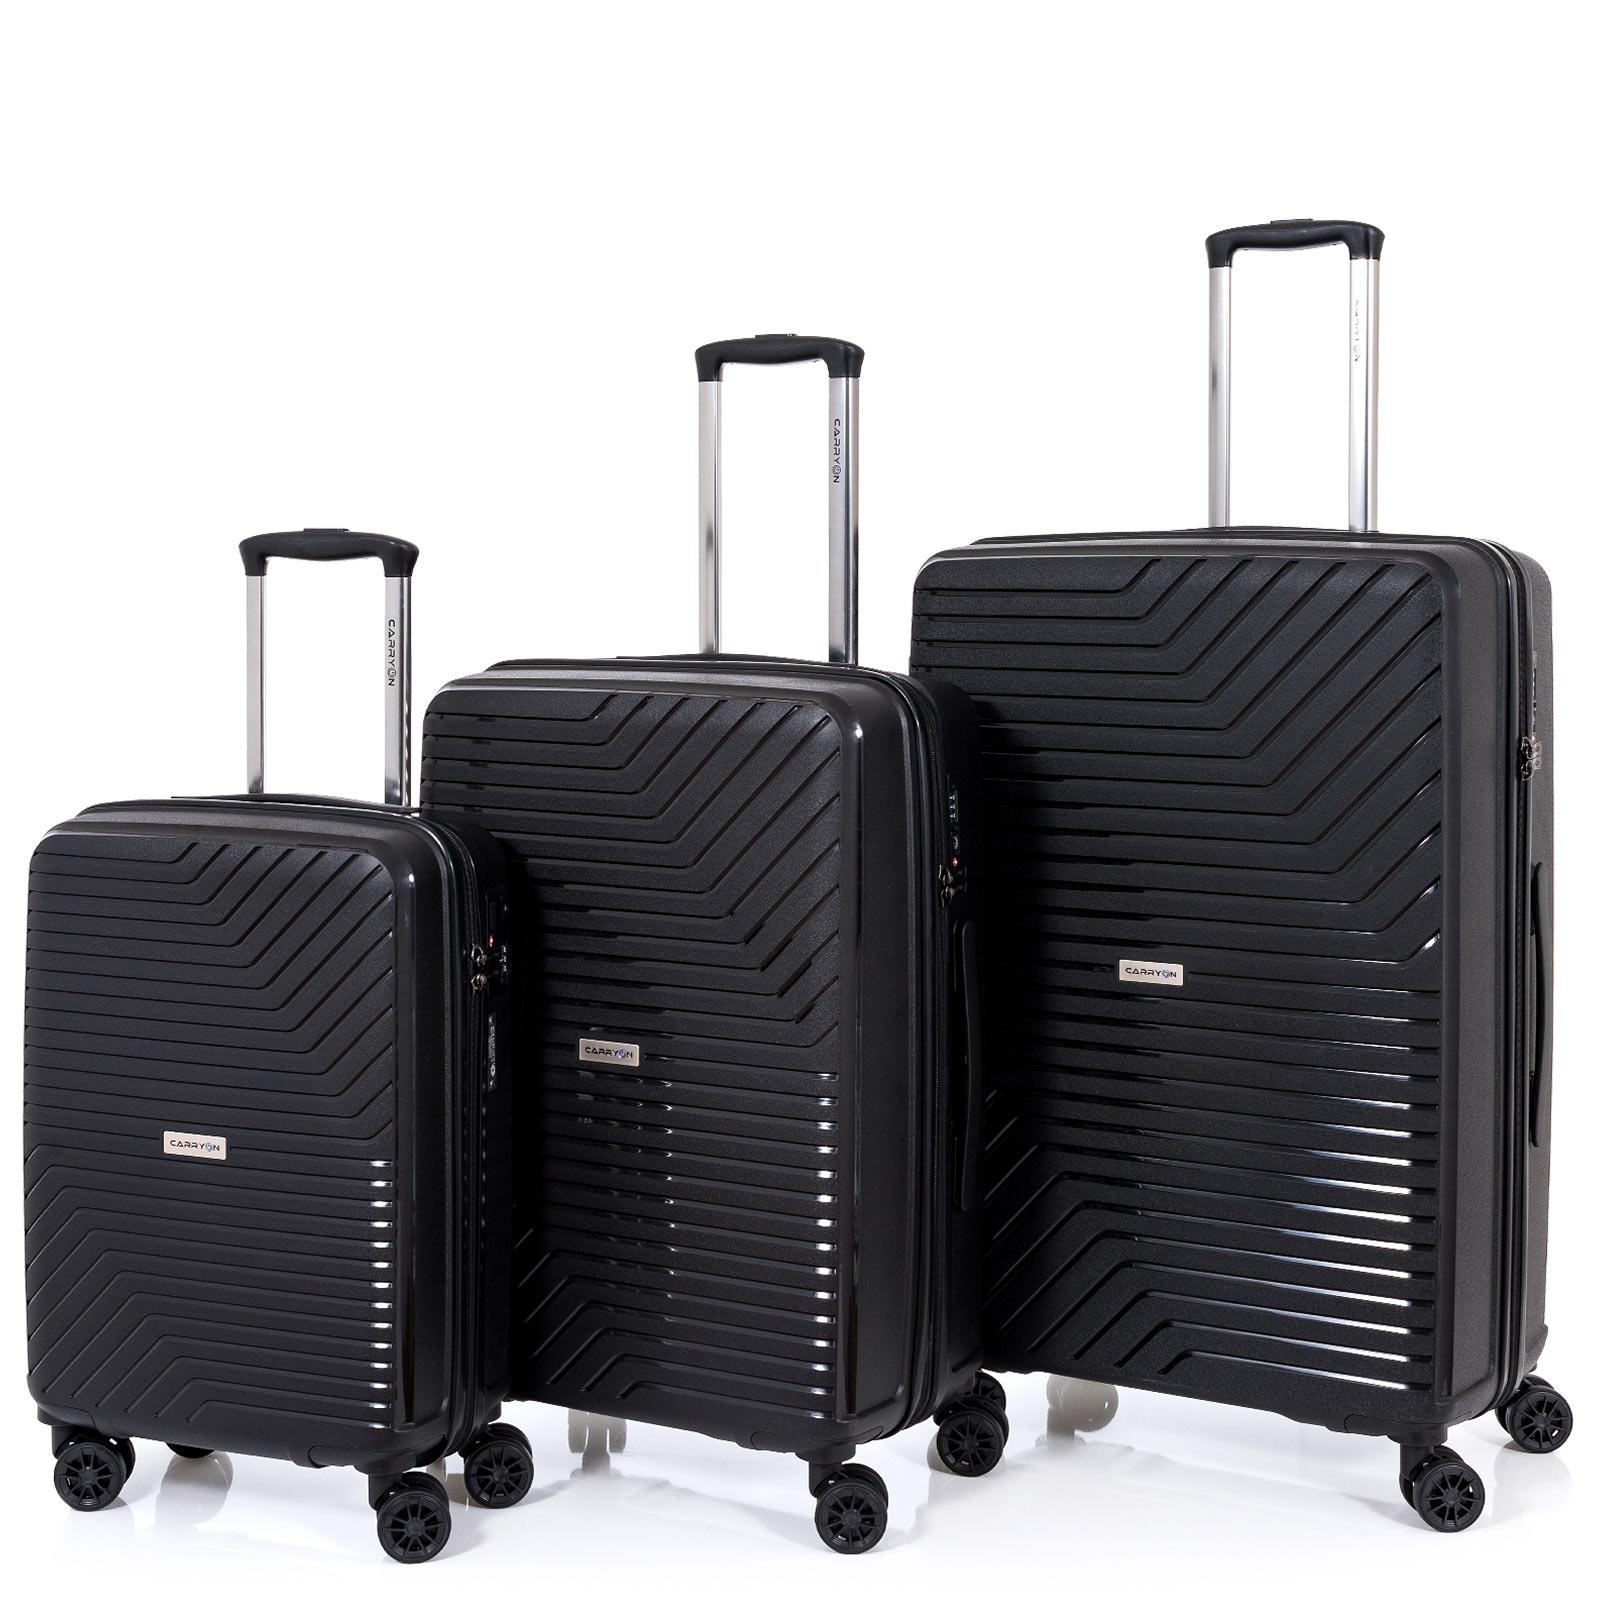 carryon-transport-3-tlg-hartschalen-koffer-set-schwarz